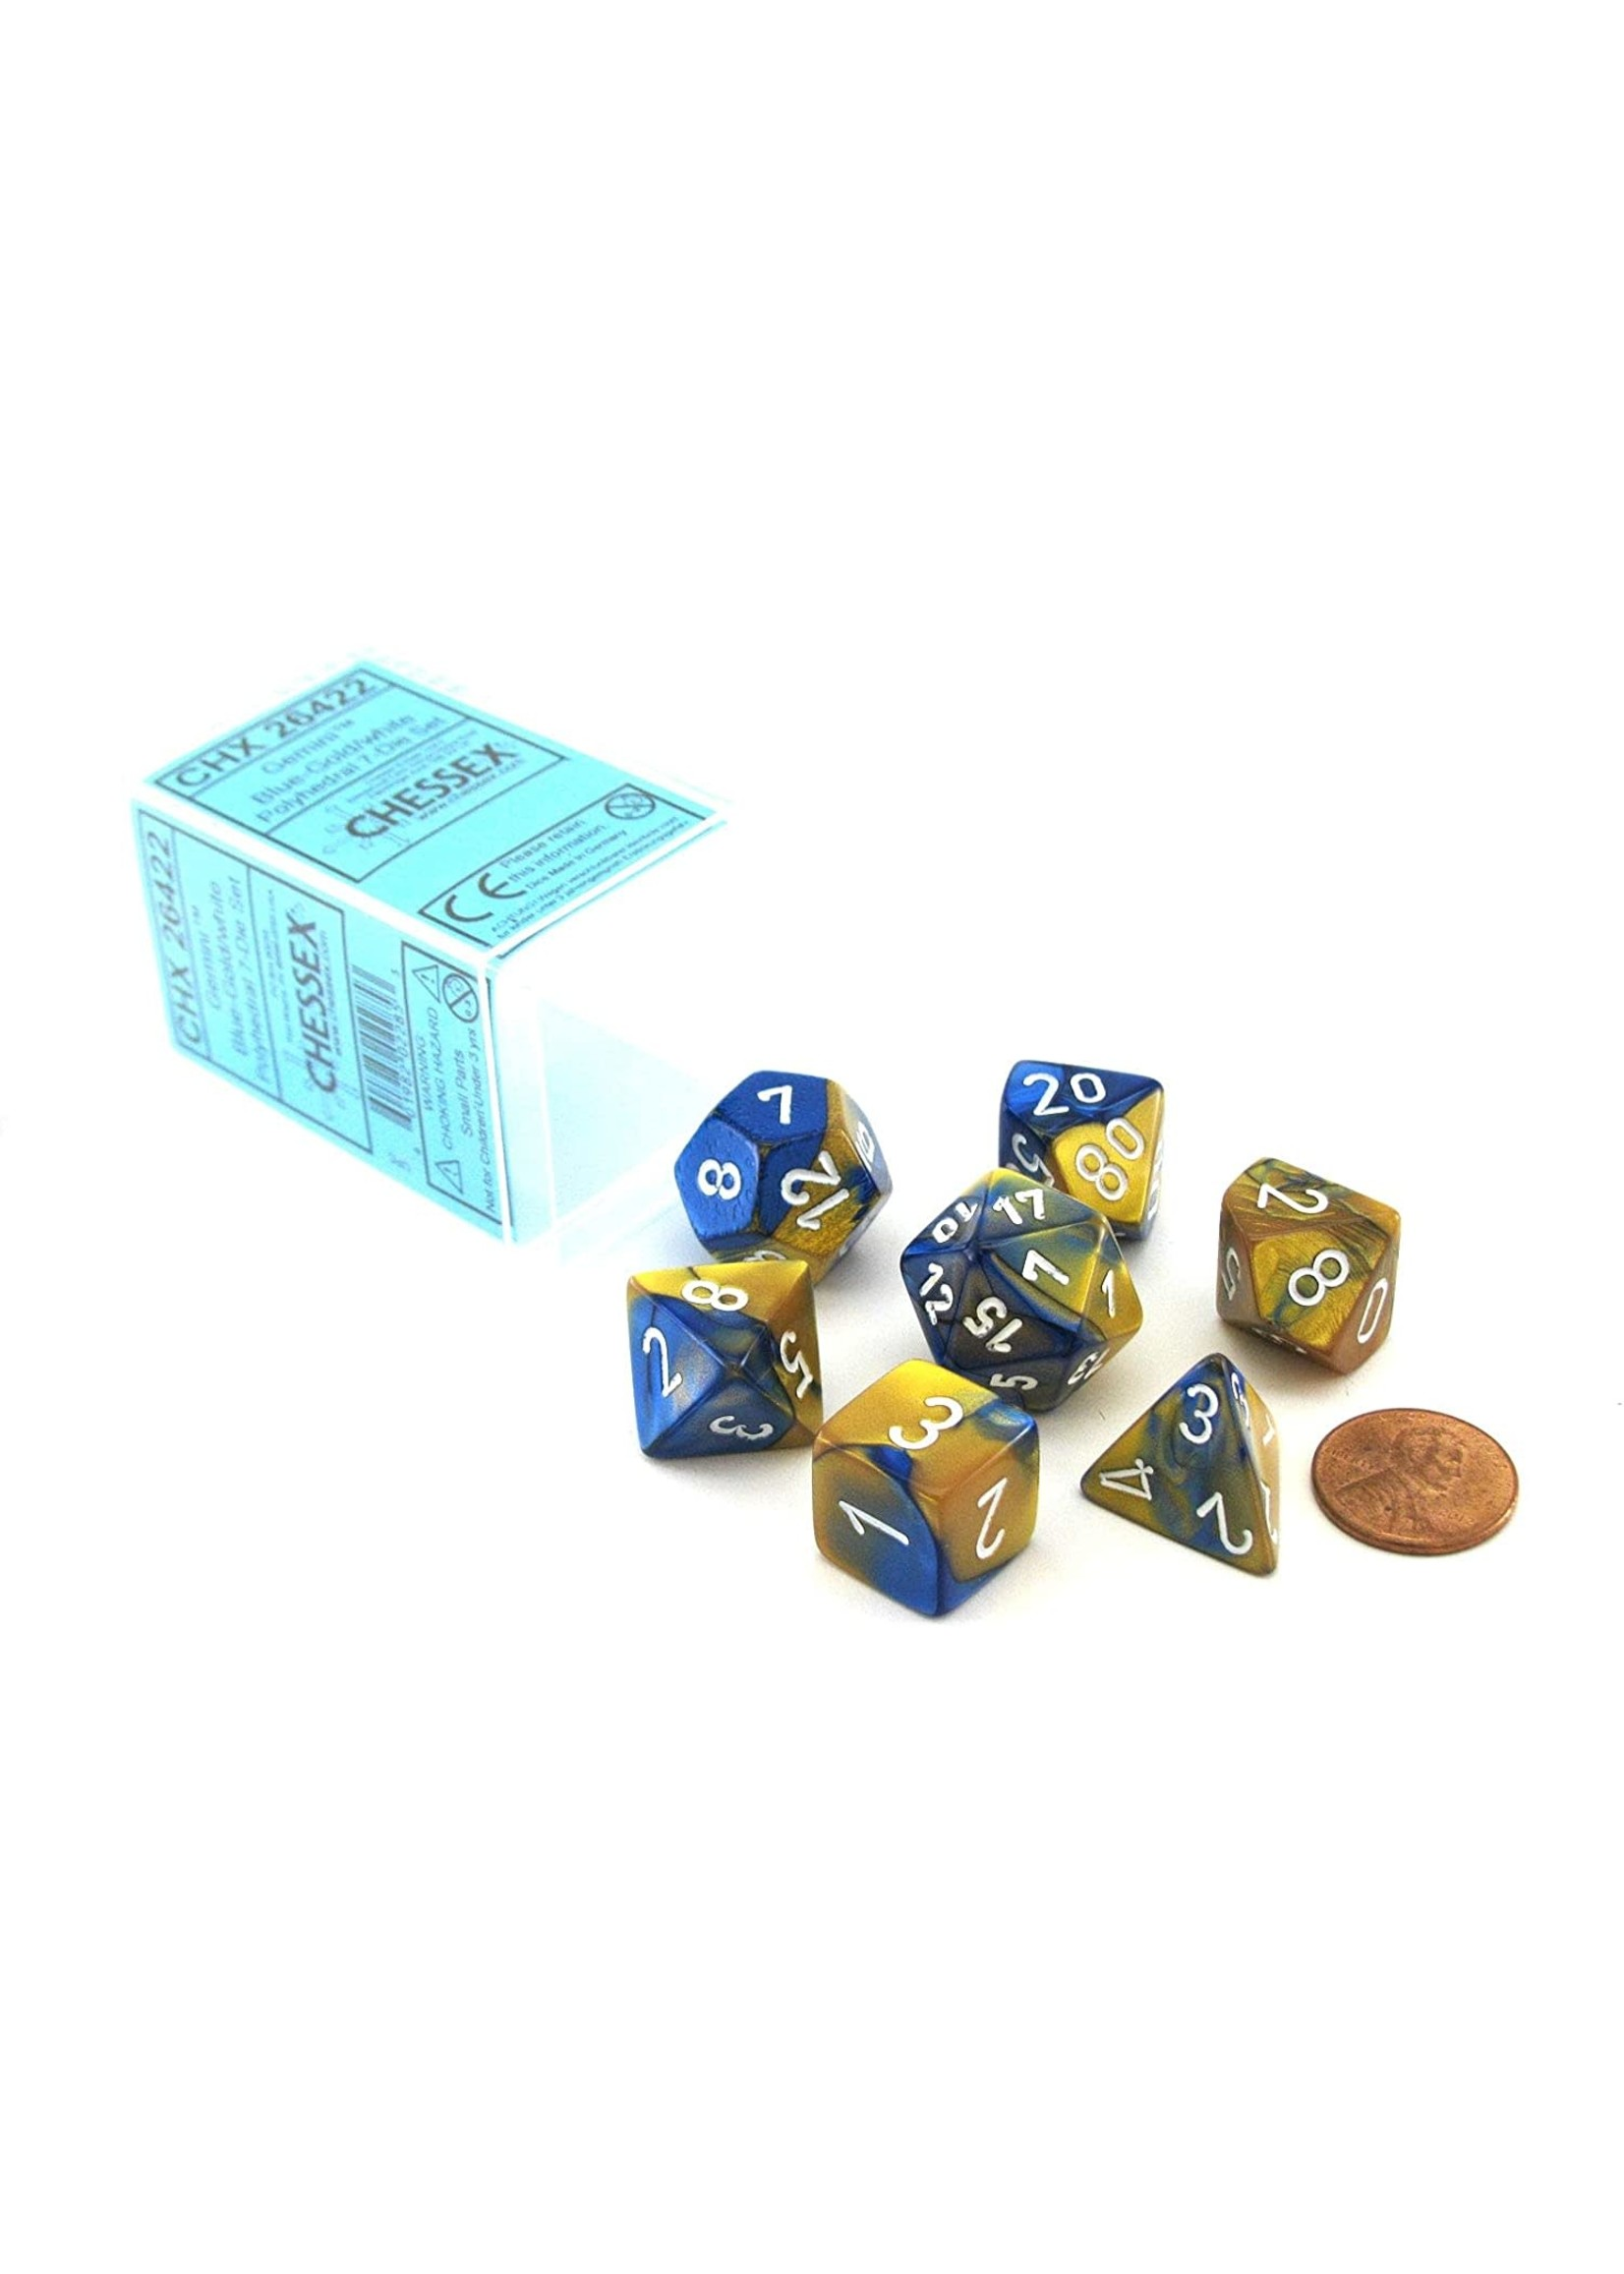 Chessex Gemini Poly 7 set: Blue & Gold w/ White